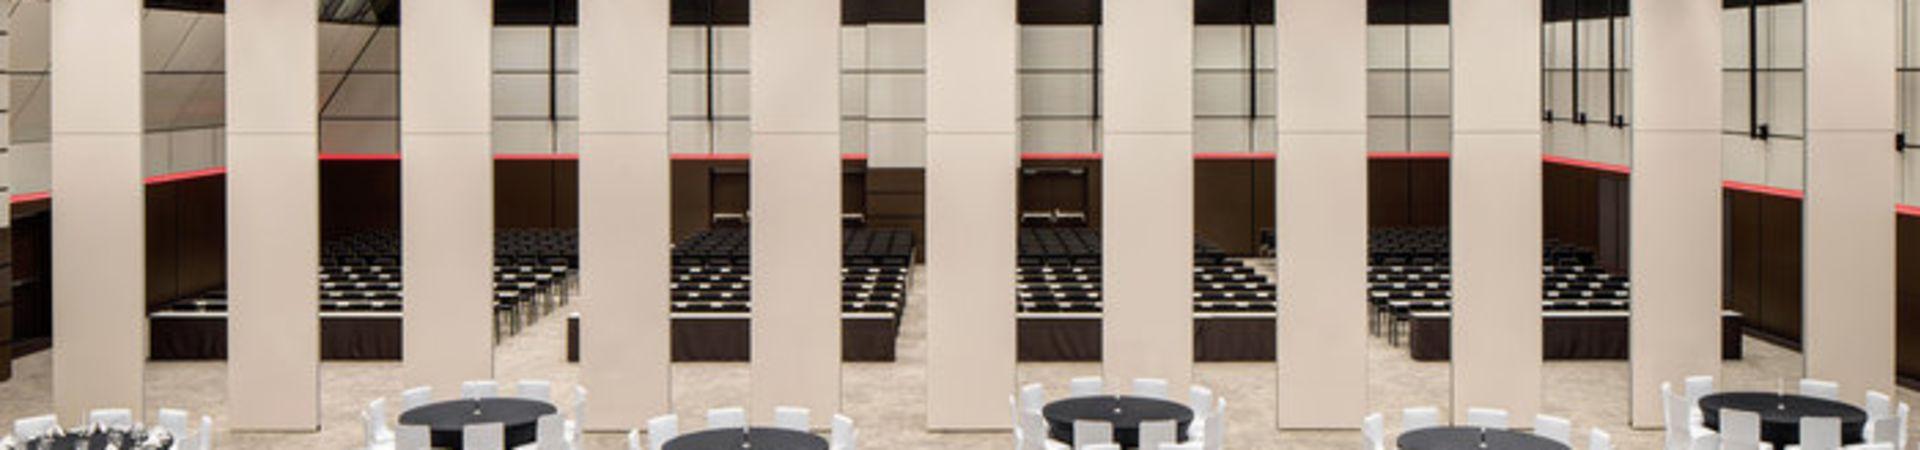 Clarion Congress Hotel Prague **** - Meridian + Zenit + Nadir